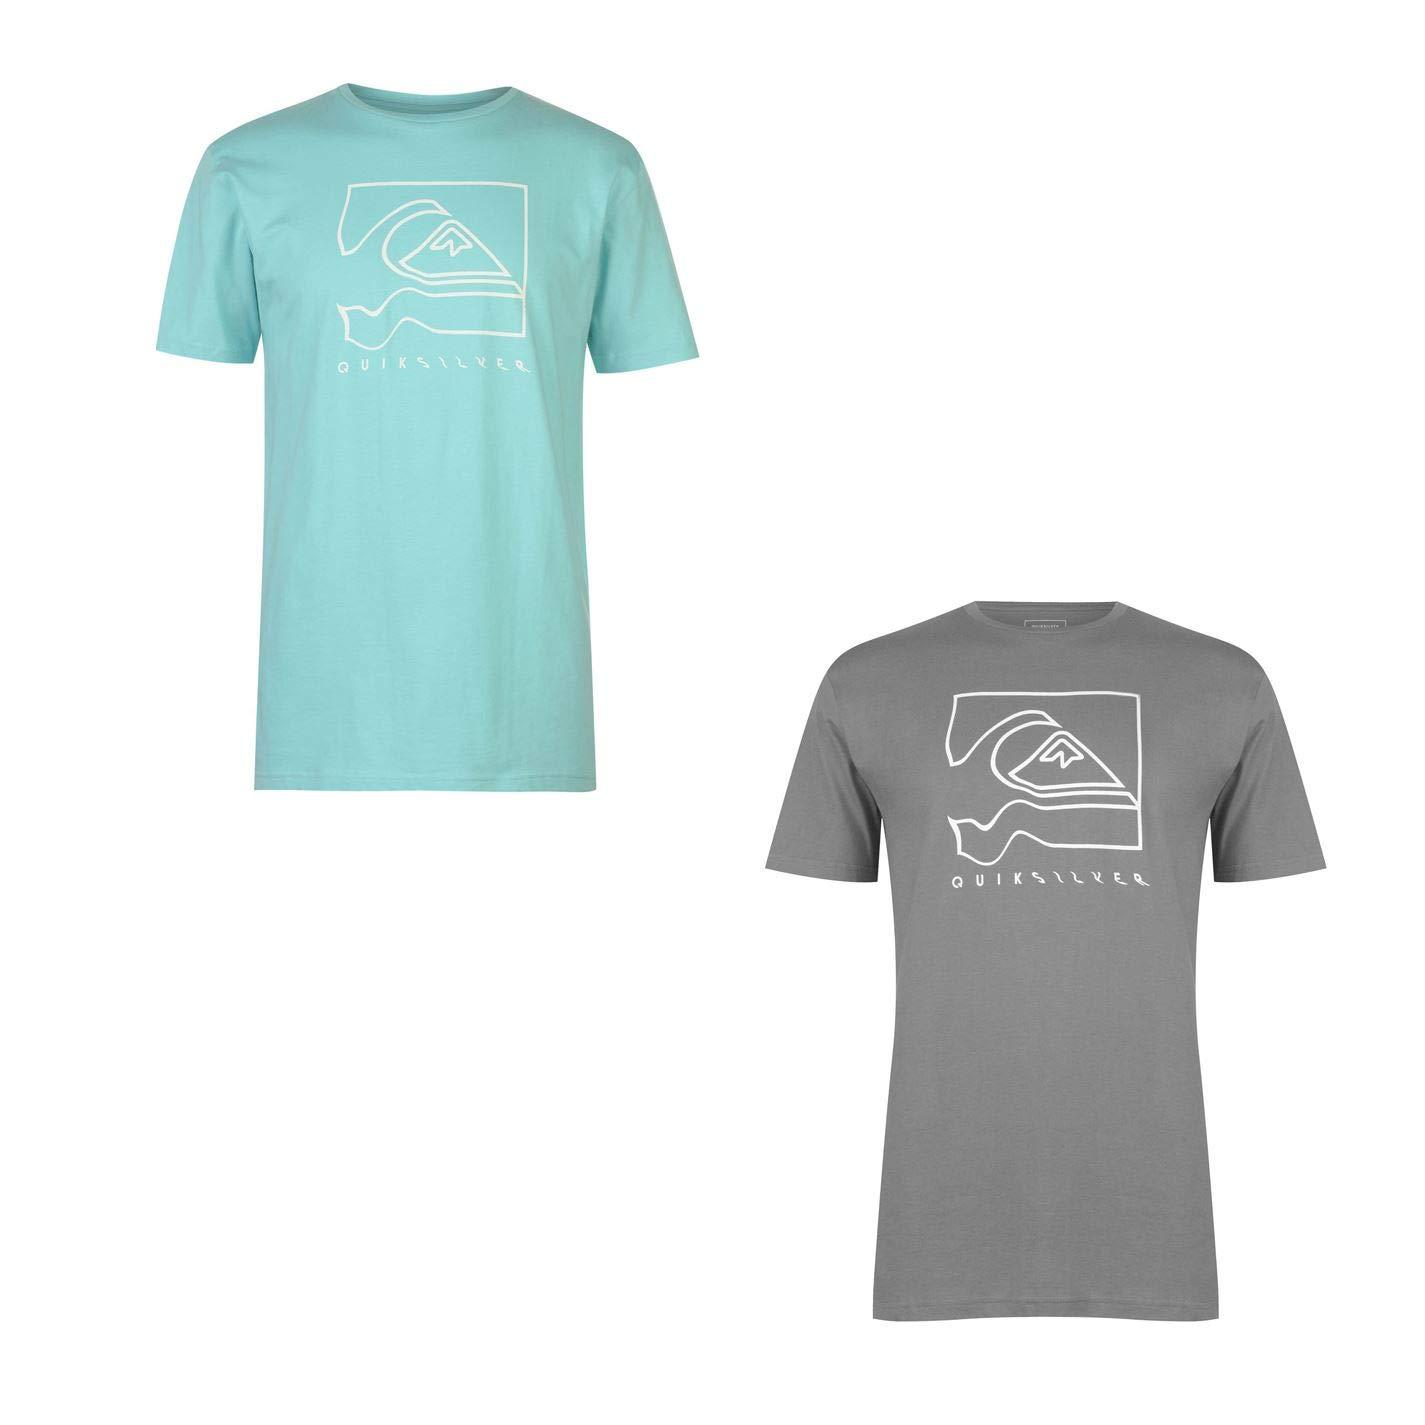 Quiksilver Distortion Logo T-Shirt Mens Top Tee Shirt Shade Small